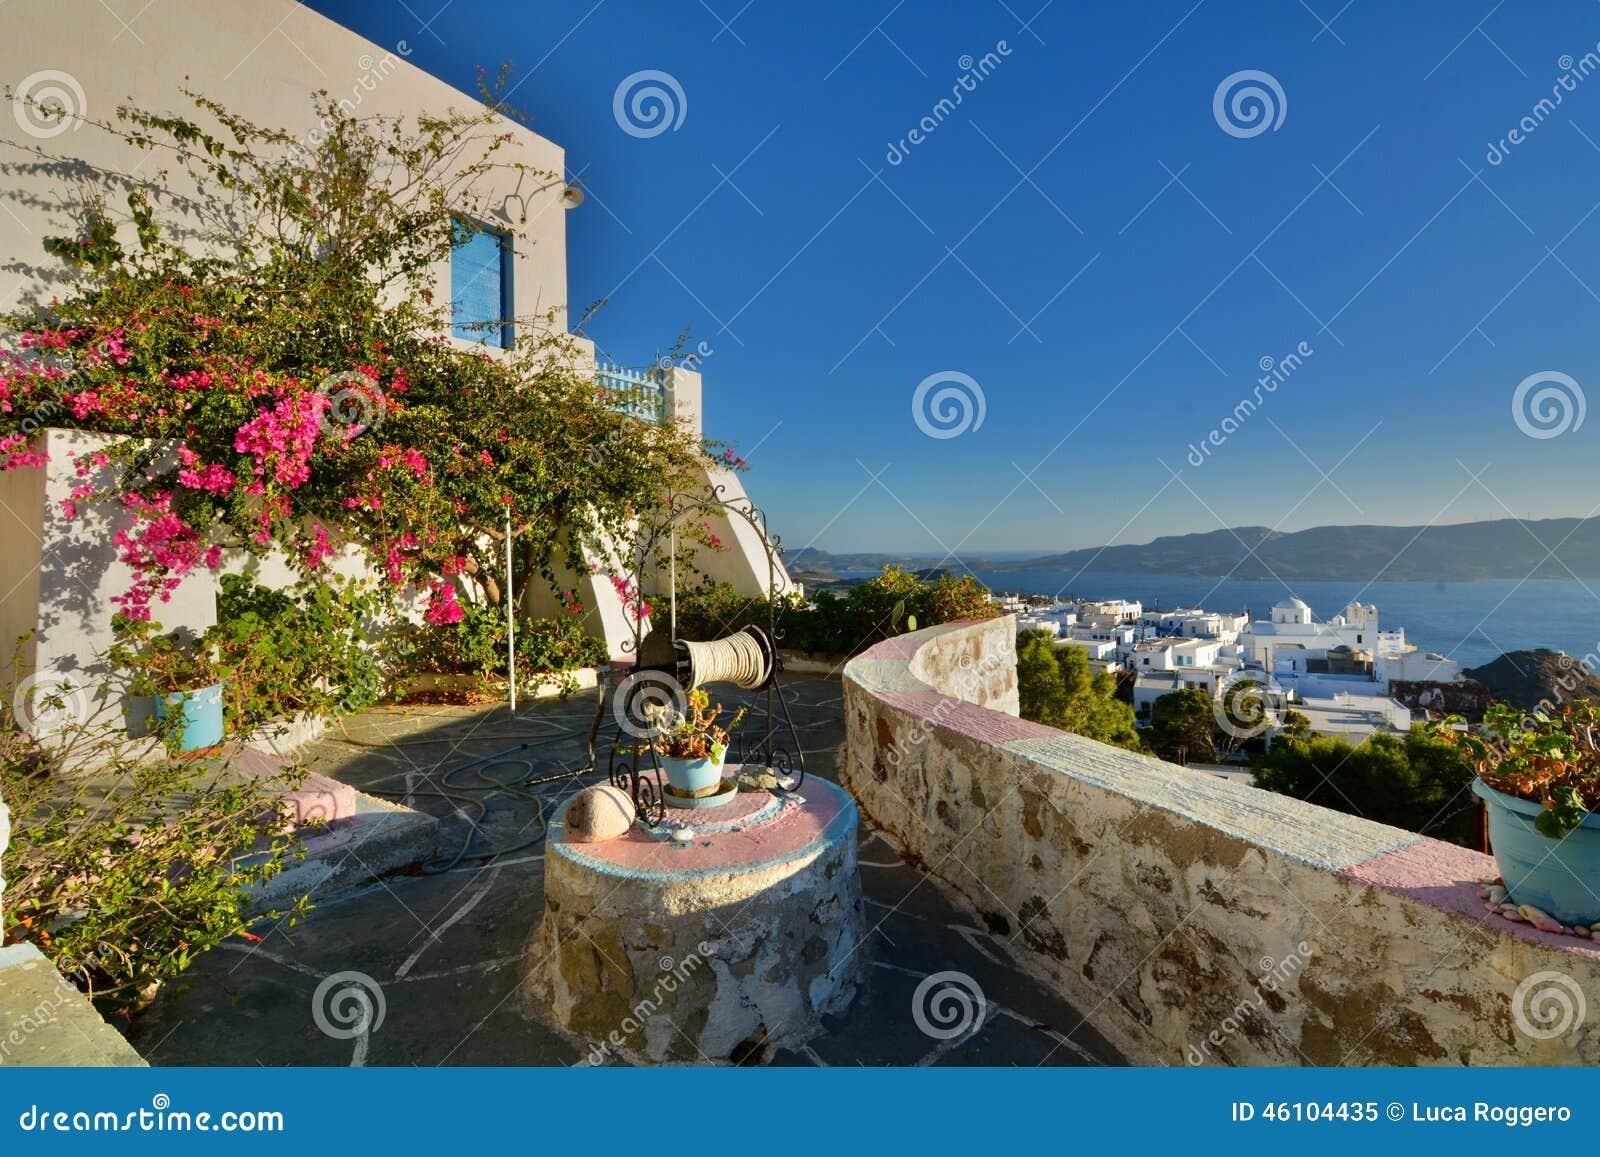 Cycladic terrace. Plaka, Milos. Cyclades islands. Greece